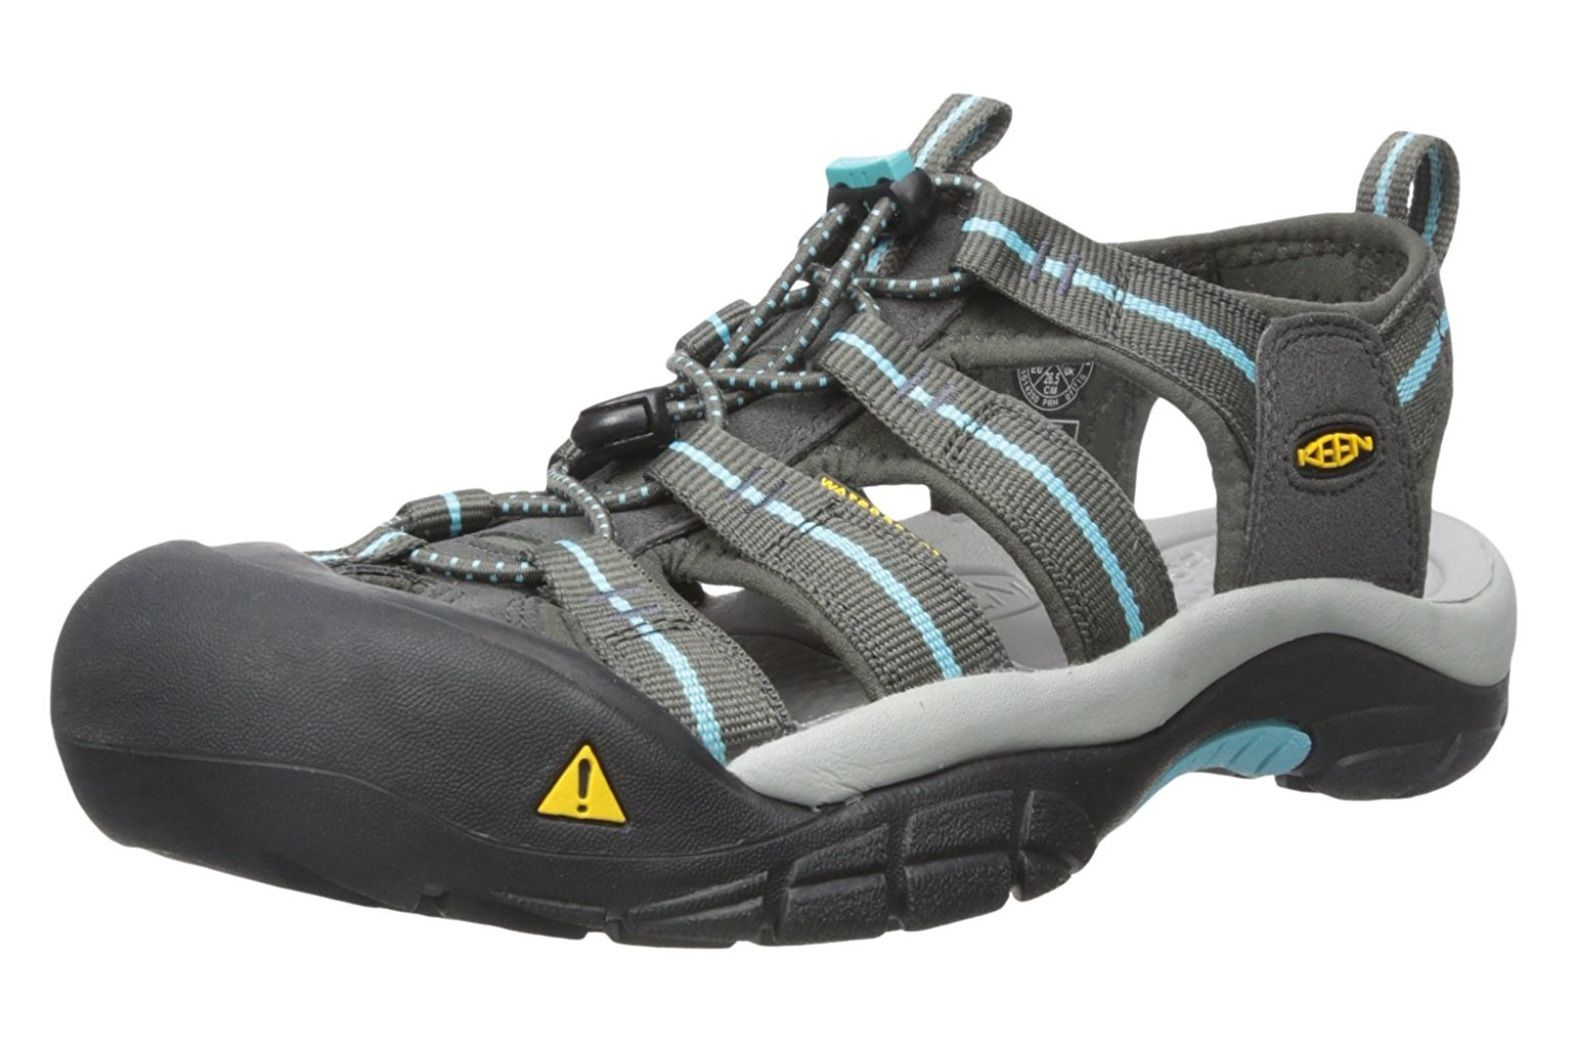 Top 10 Picks For Walking Sandals